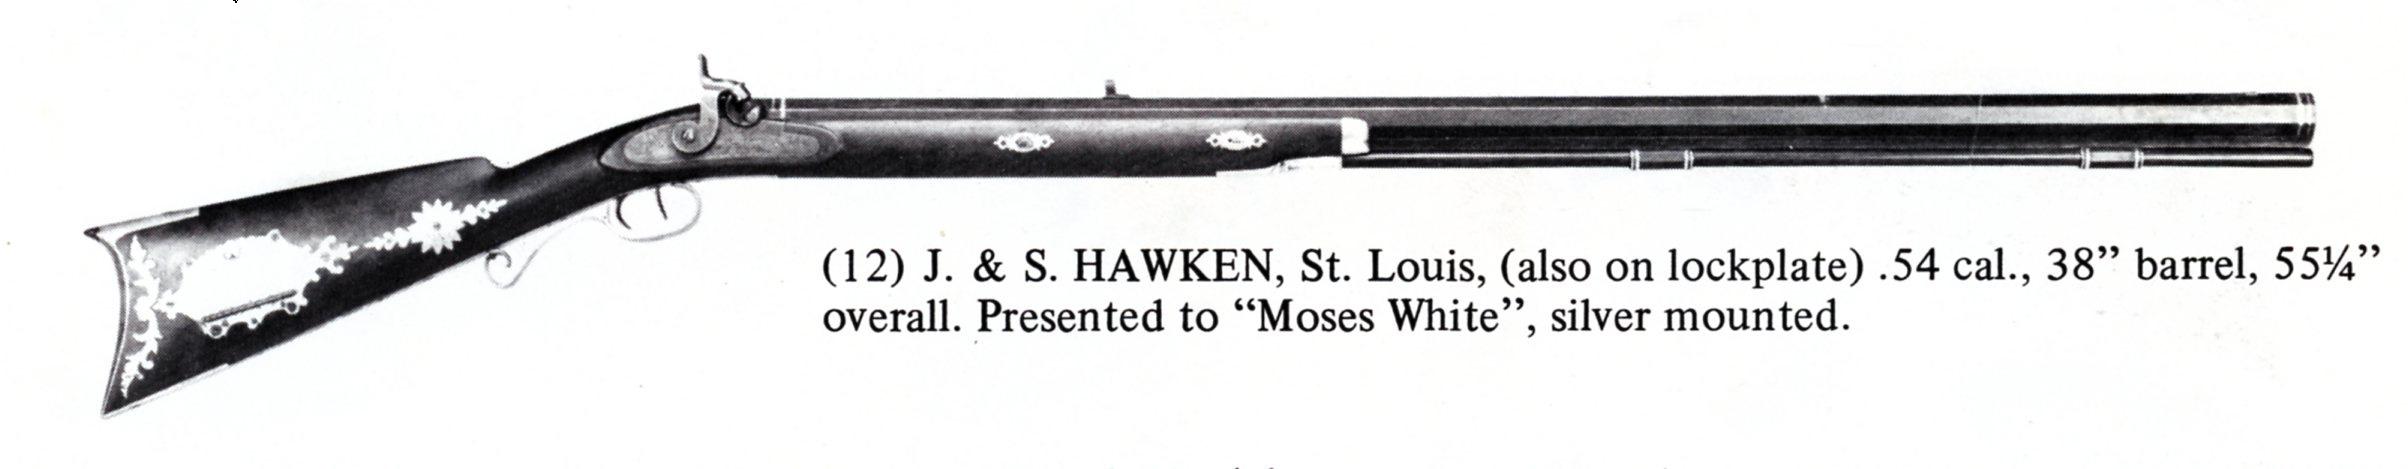 "J S Hawken Moses White HS catalog"" border=""0"